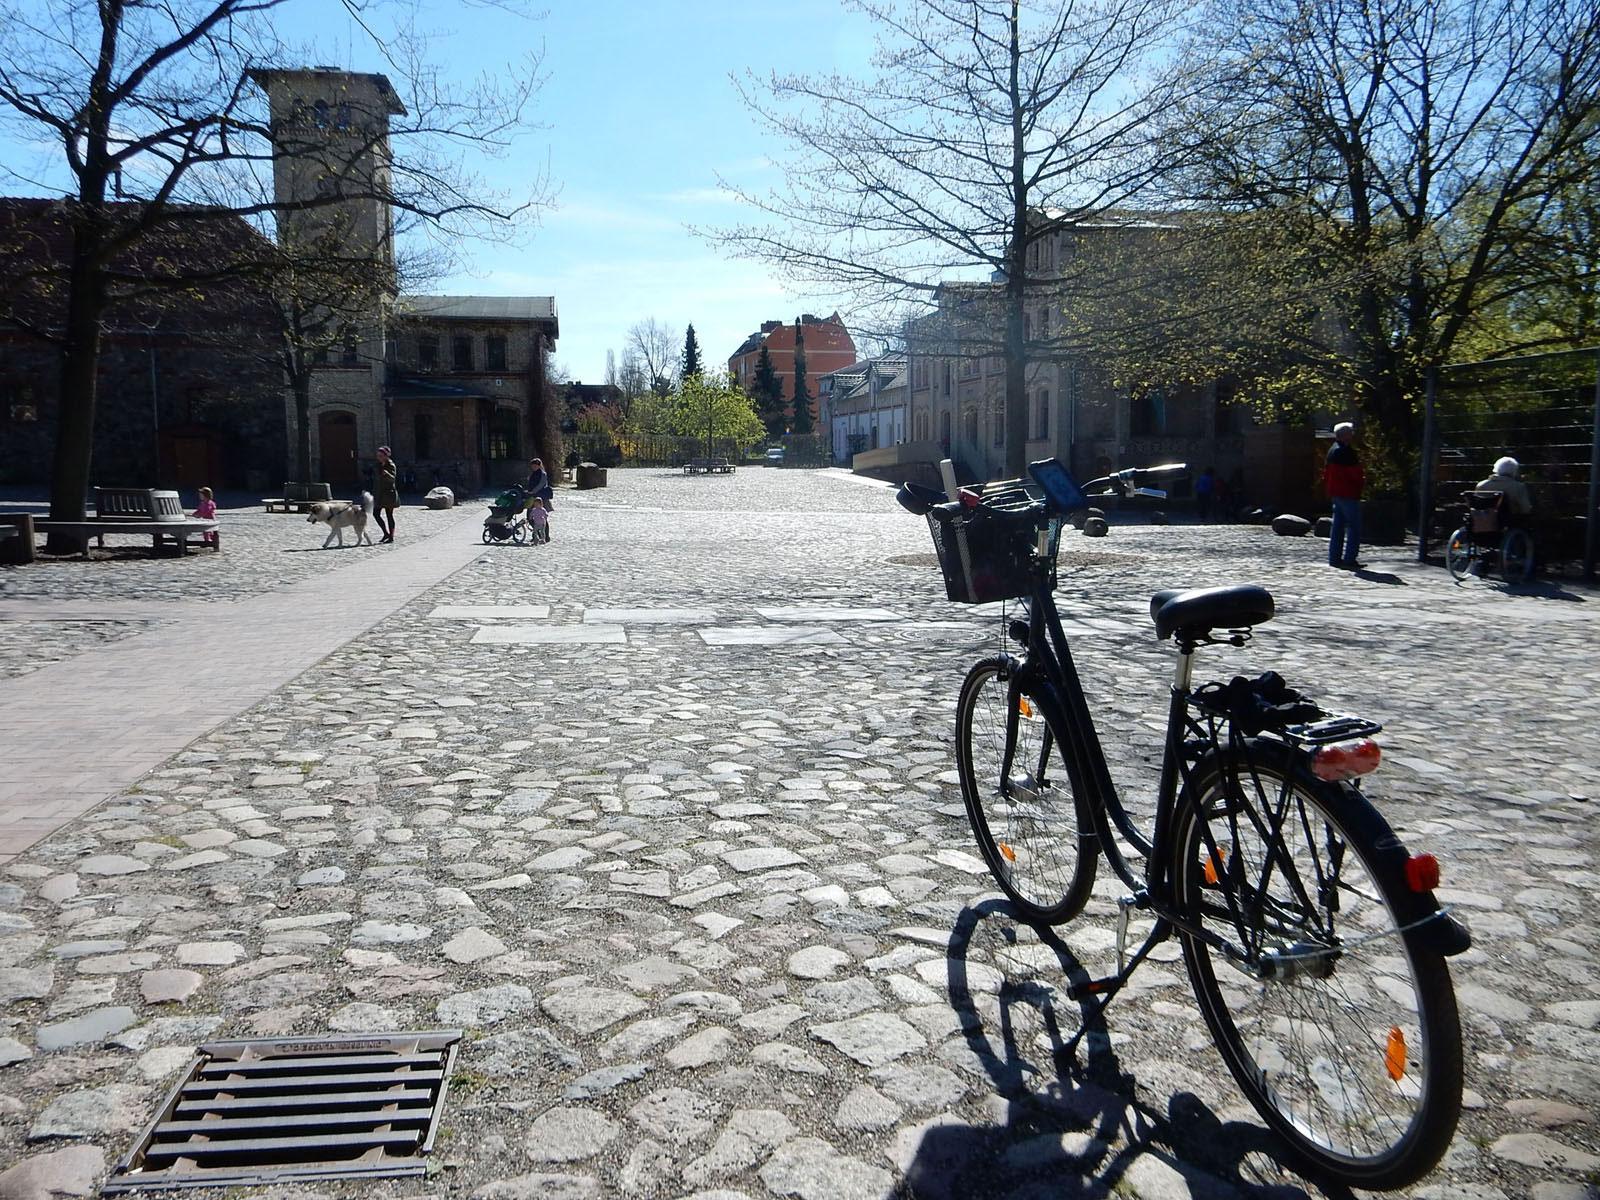 Radtour Berlin Neukölln - Gutshof Britz